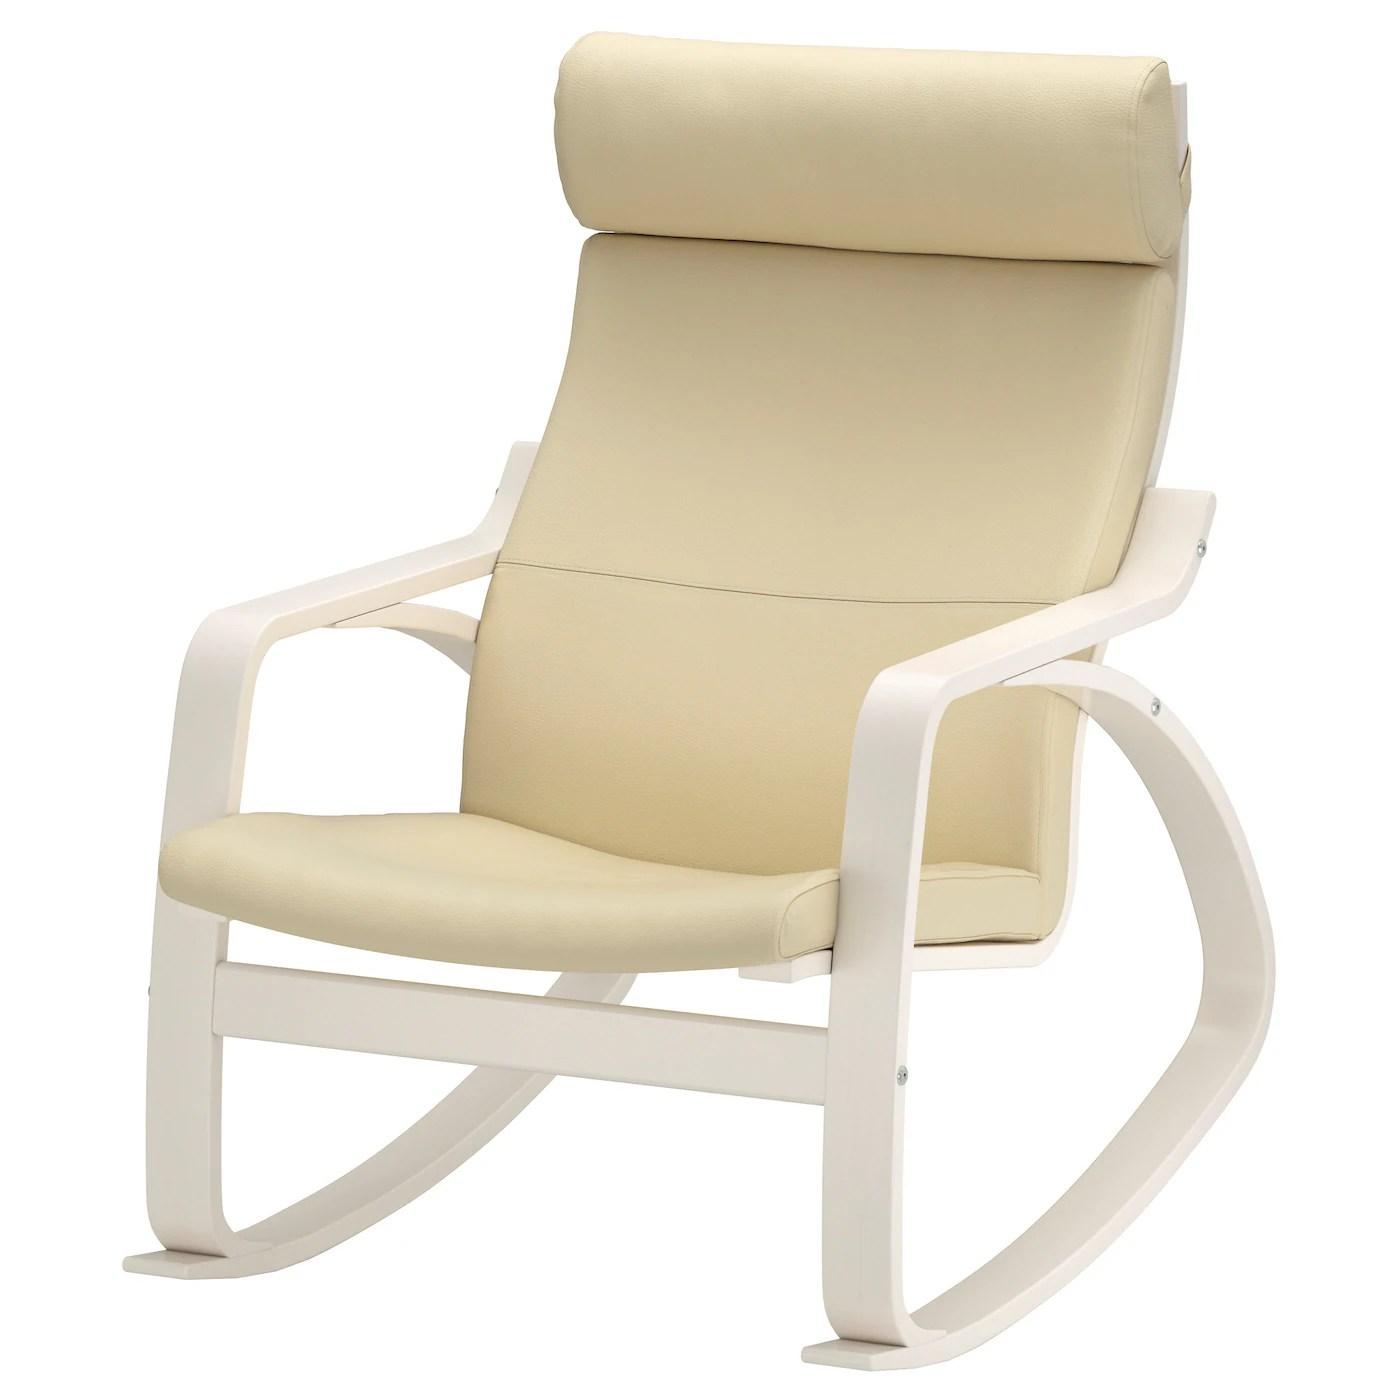 ikea white rocking chair hammock stand uk poÄng glose off